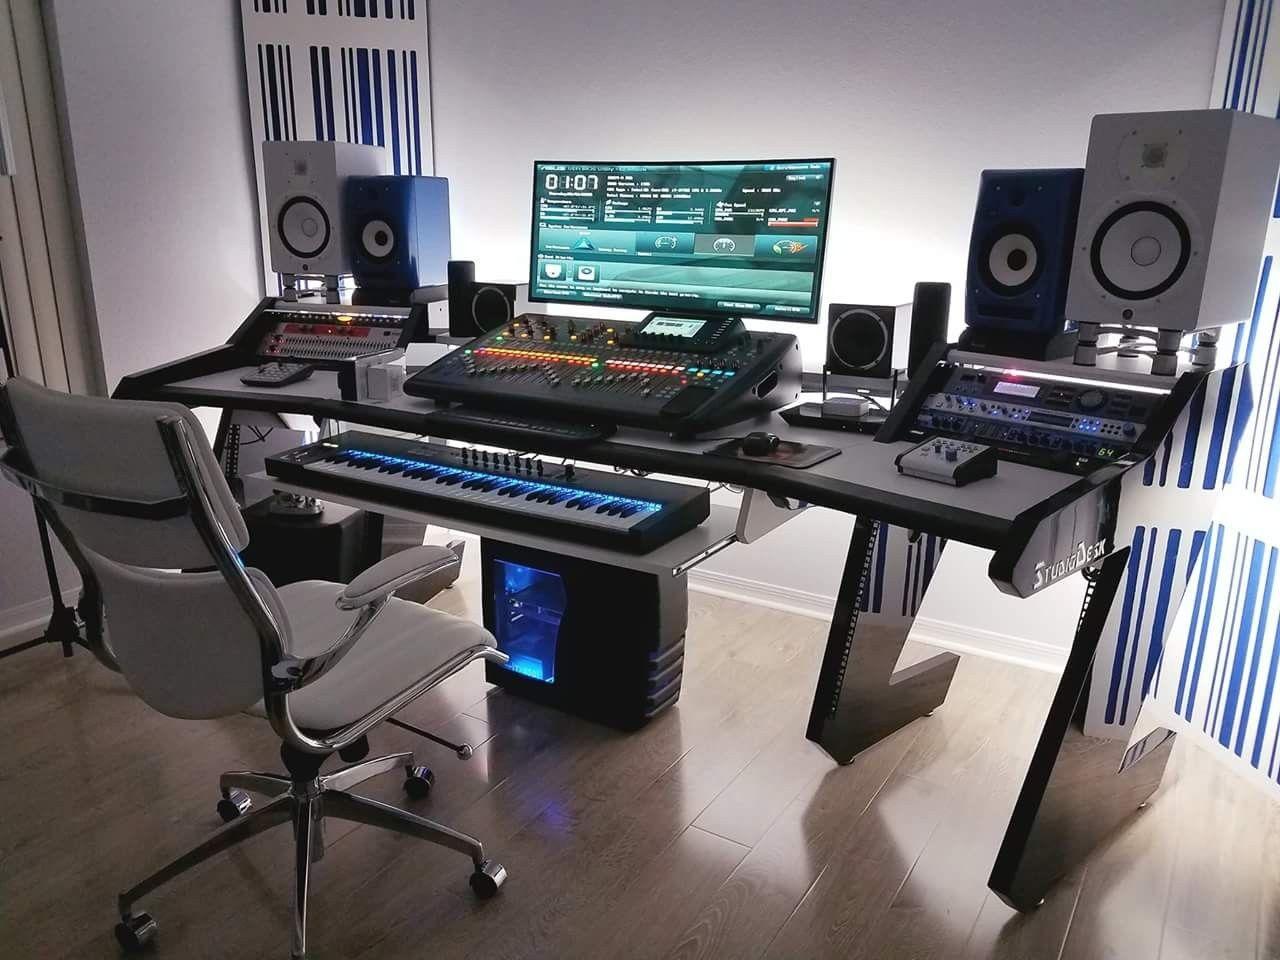 Ongekend Music studio   Home studio desk, Music studio room, Recording MT-59